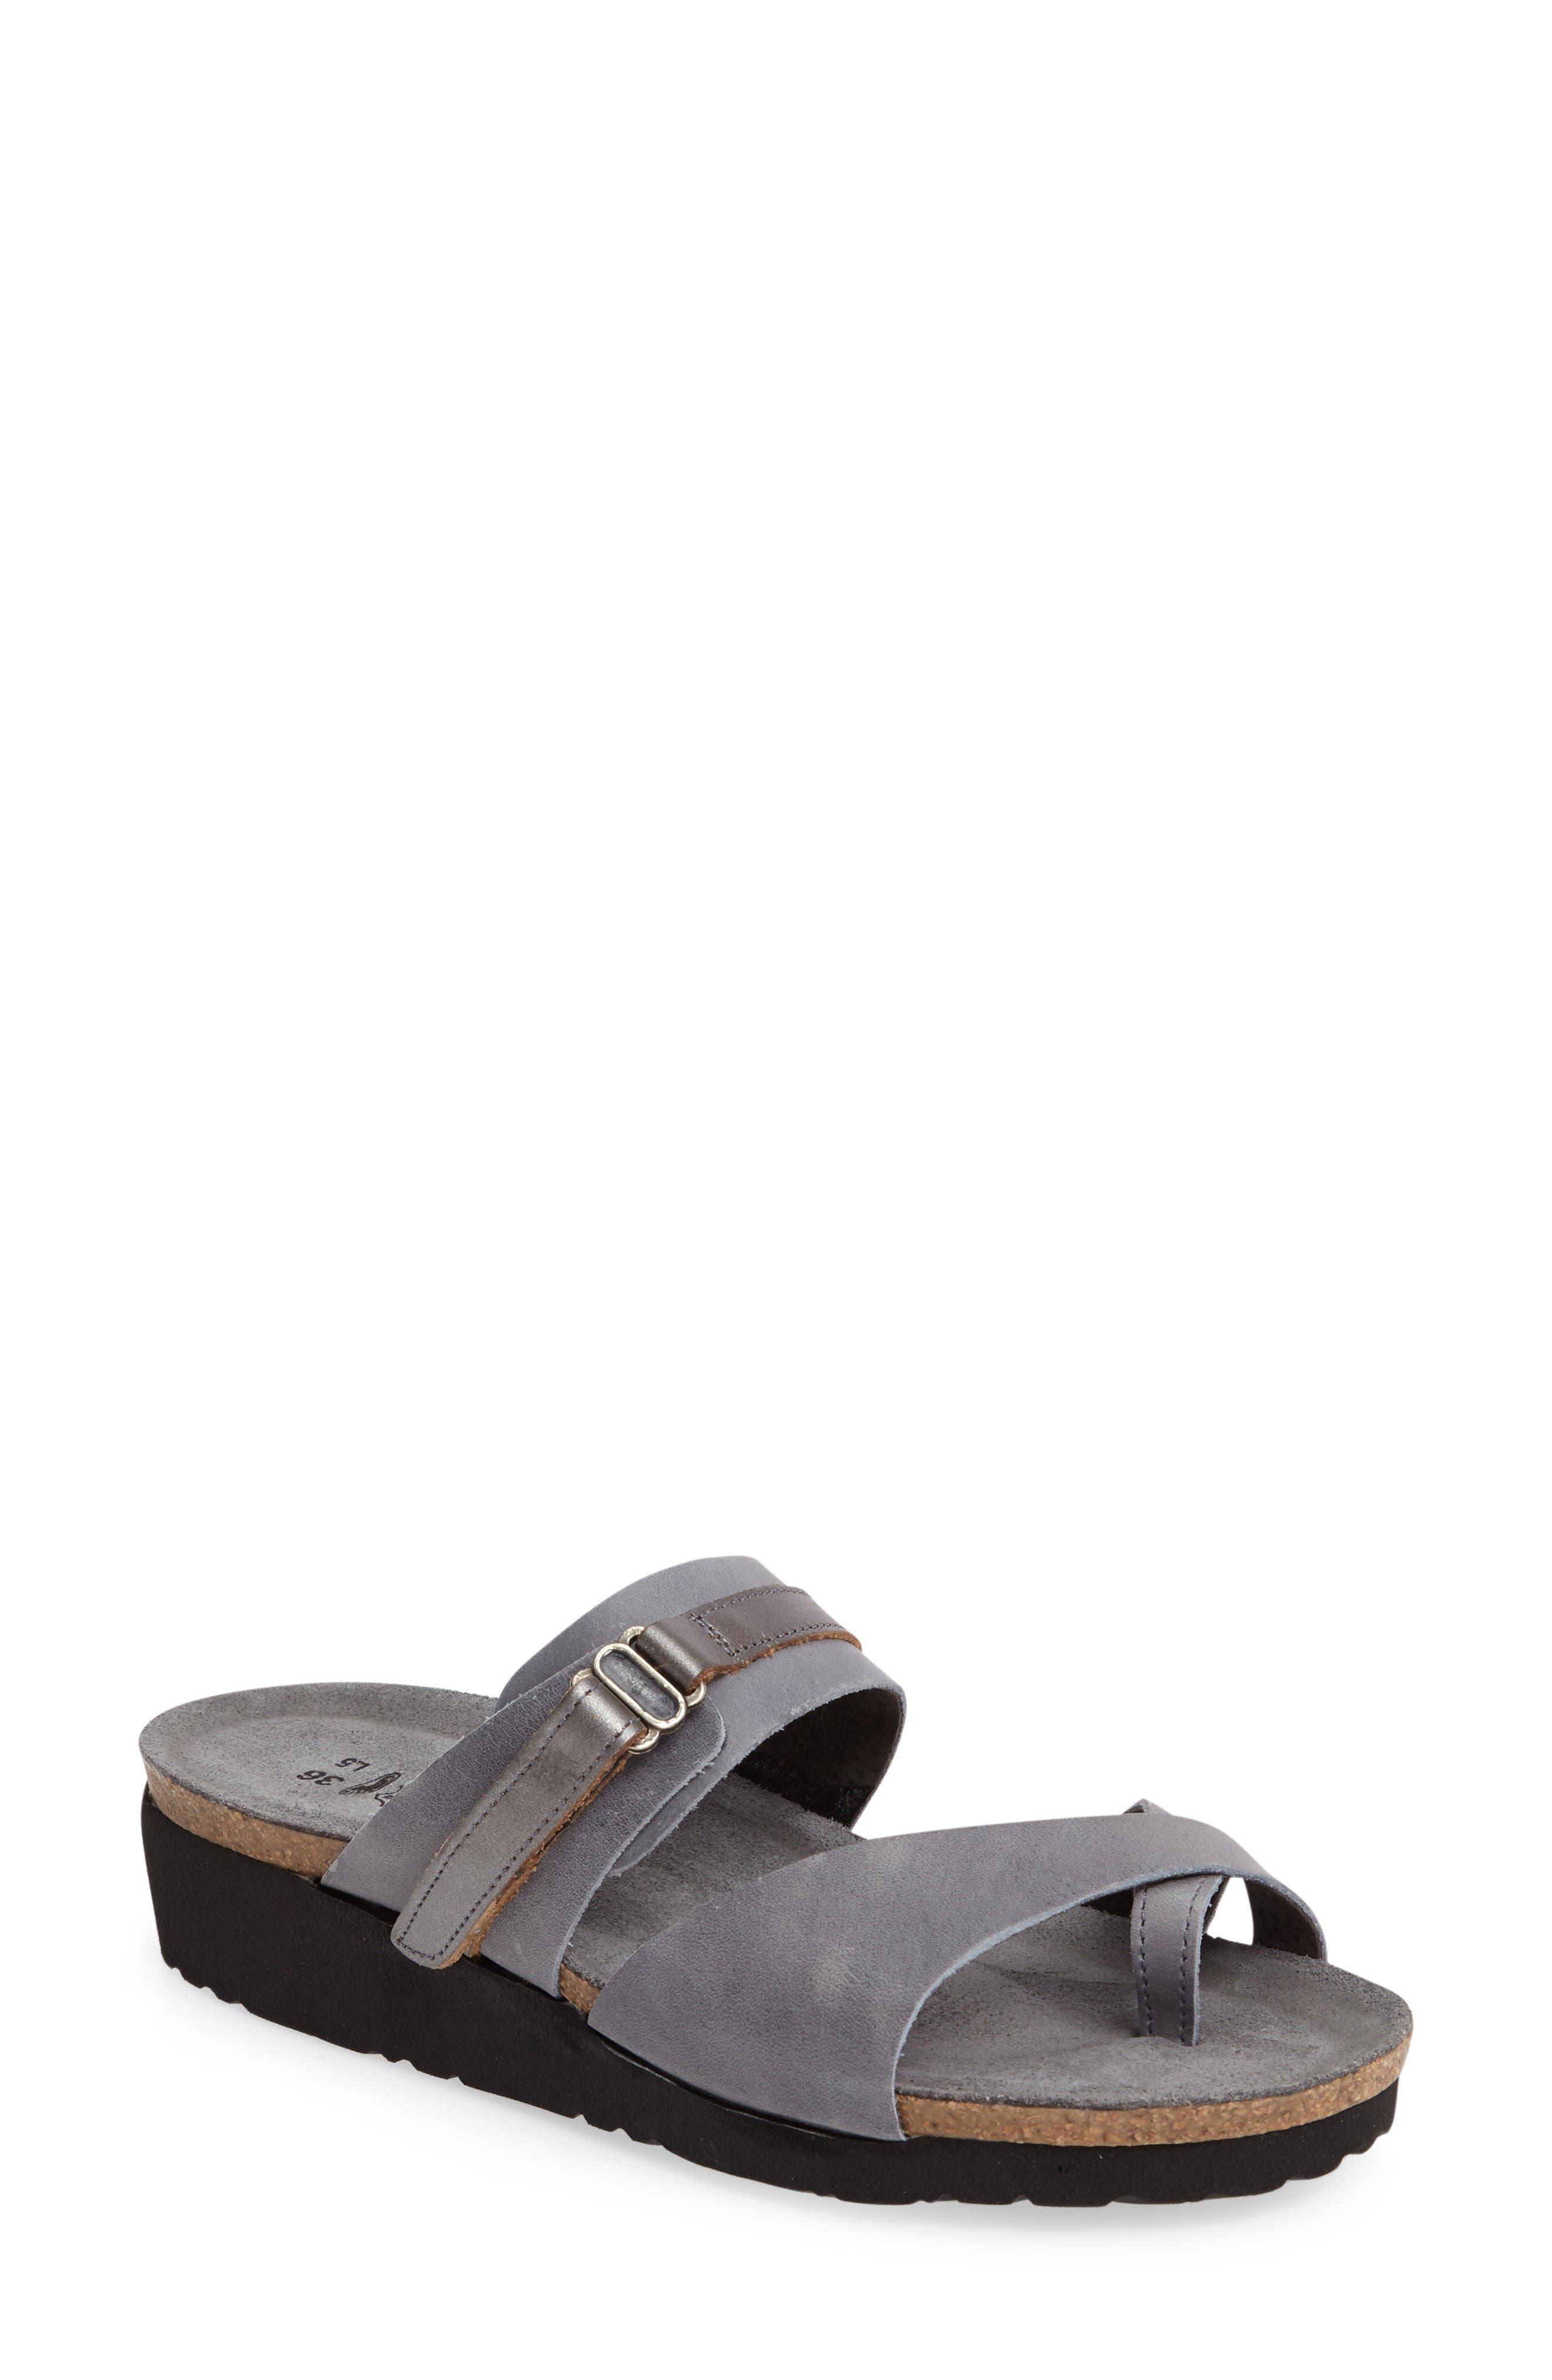 Jessica Sandal,                         Main,                         color, Vintage Slate Leather